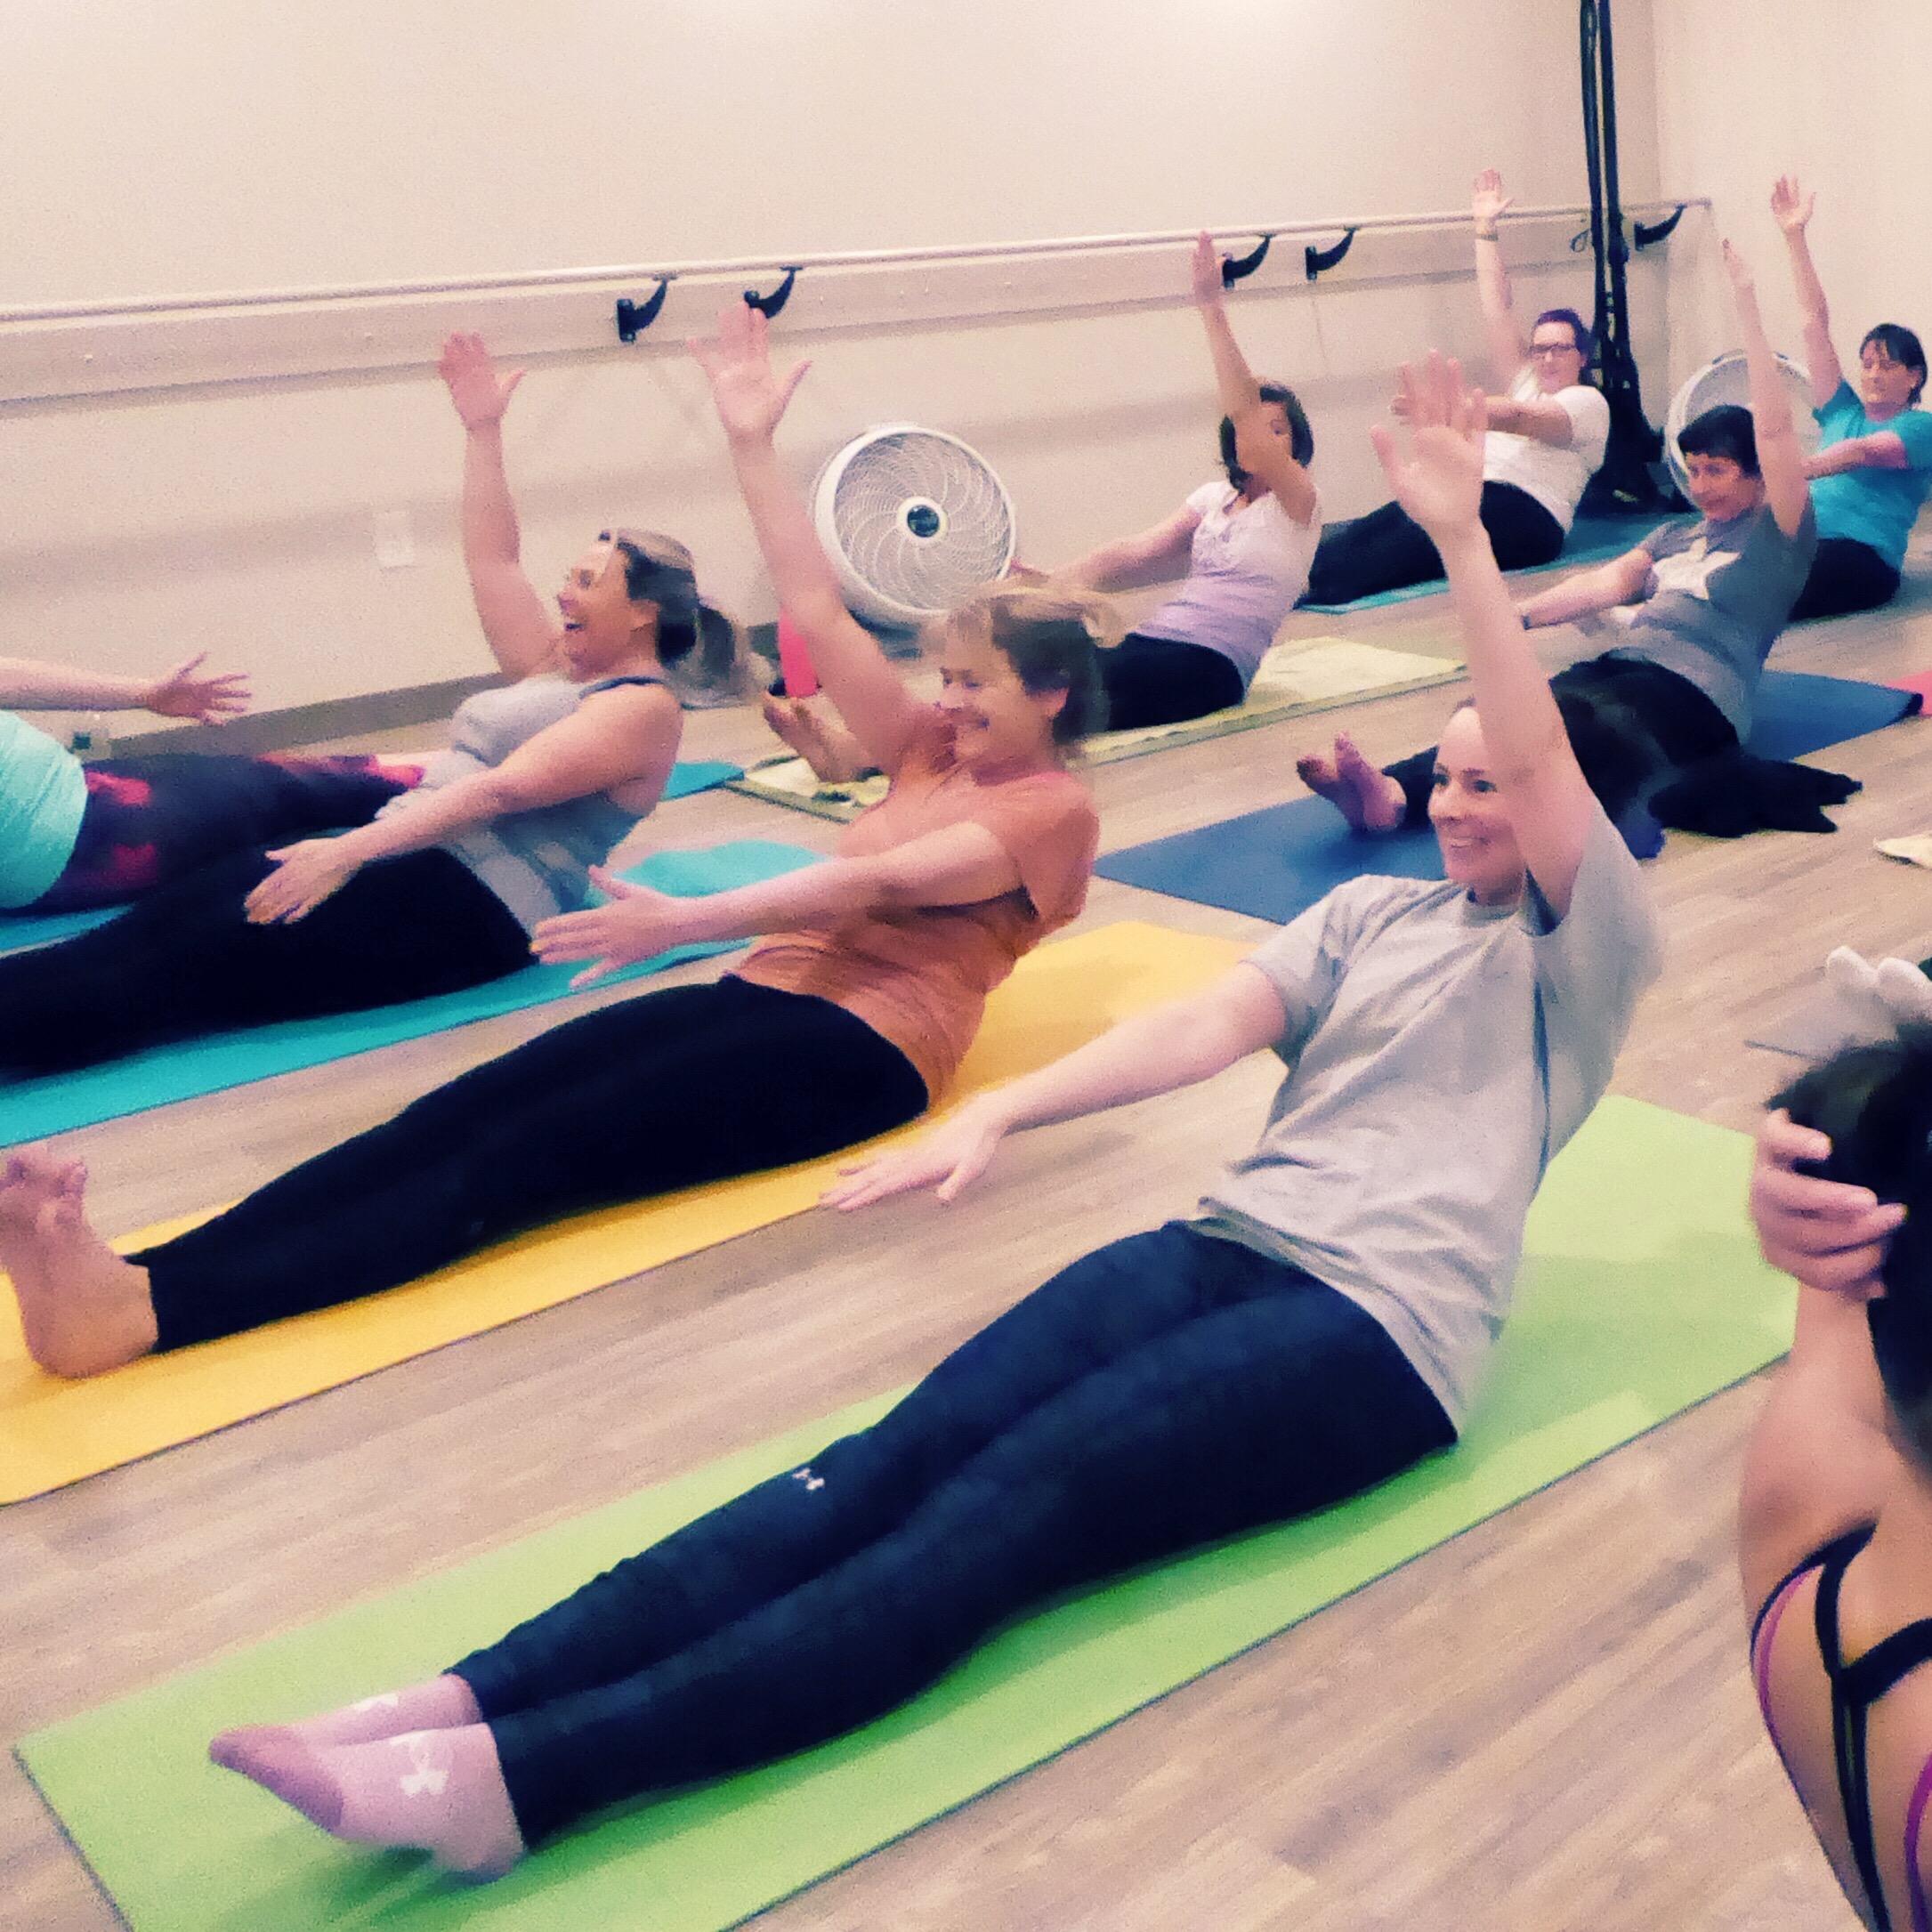 Yoga Personal Training Fitness Classes Latham Ny Wellnest Studios Fitness Wellness